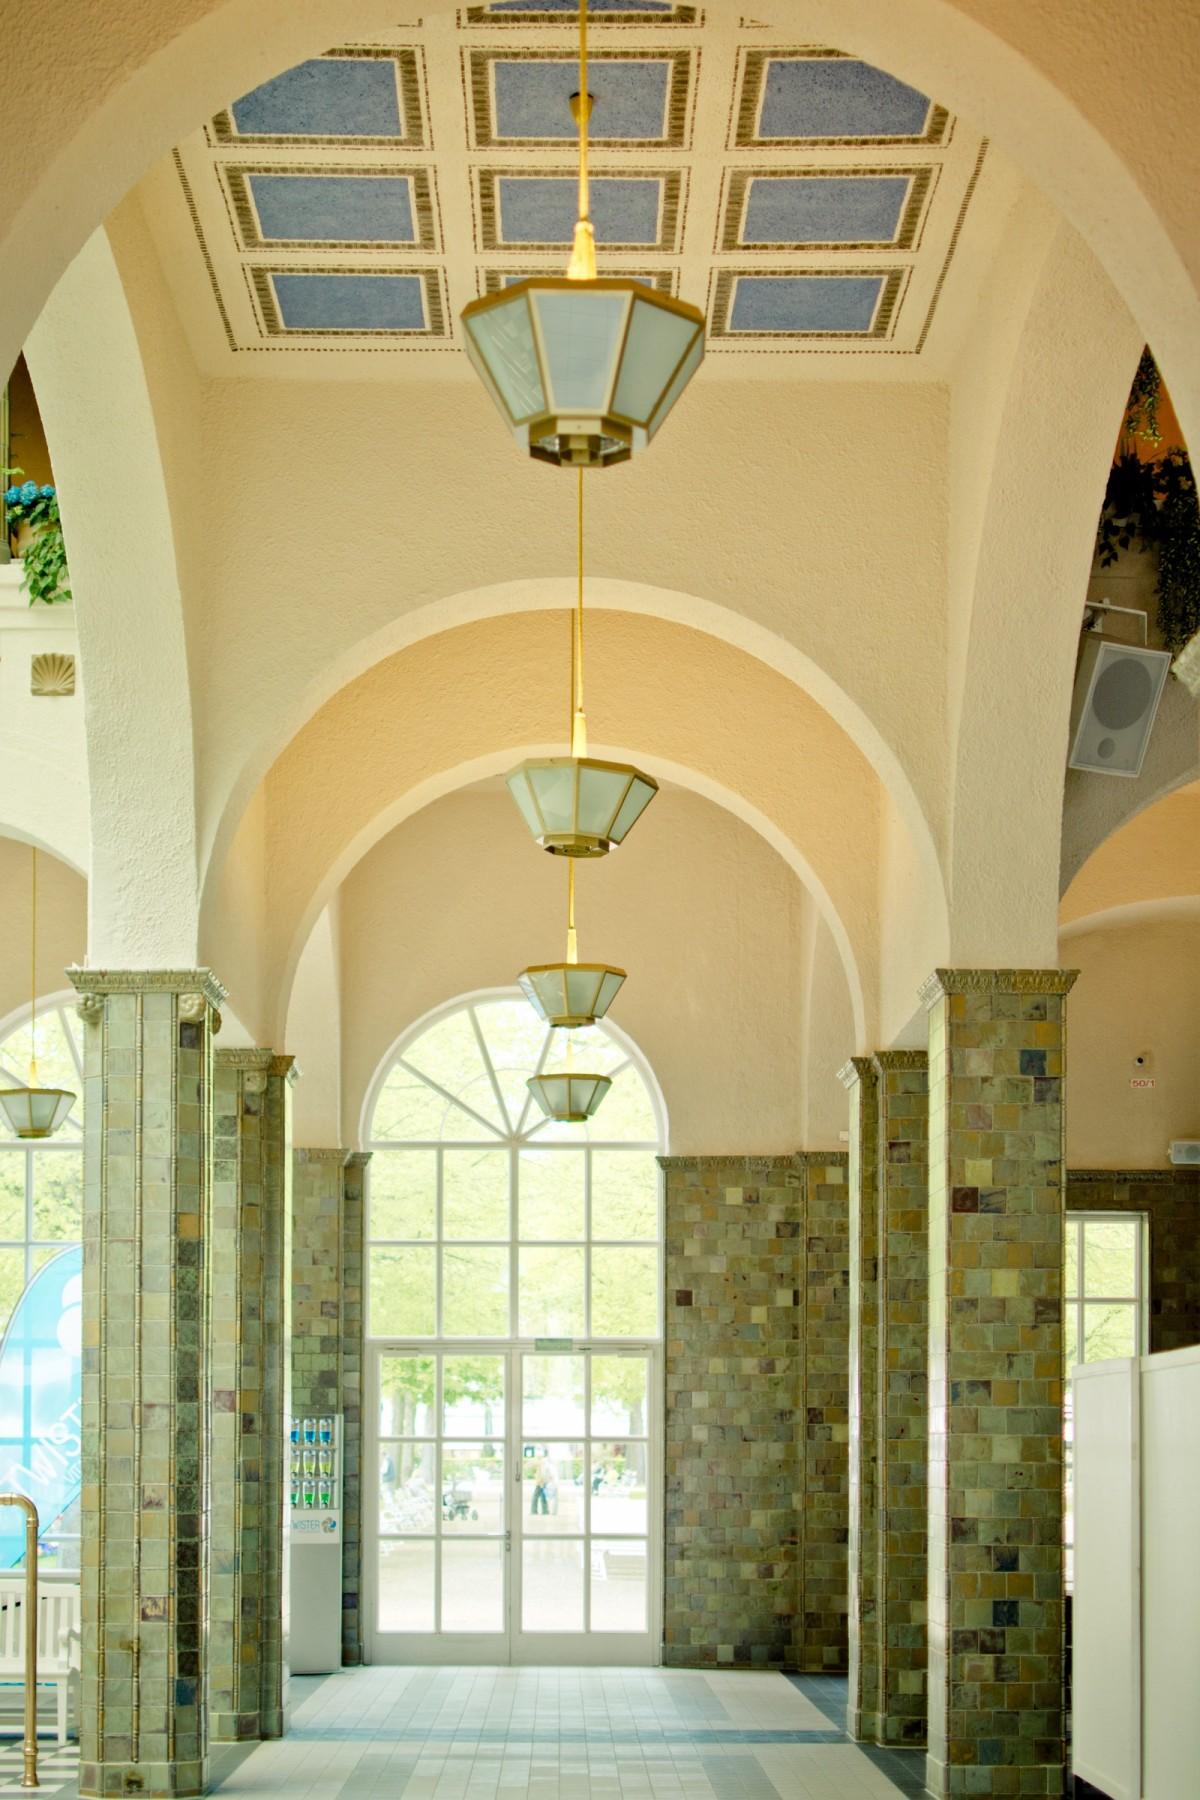 Gratis afbeeldingen licht architectuur huis boog plafond hal kasteel interieur ontwerp - Huis interieur architectuur ...